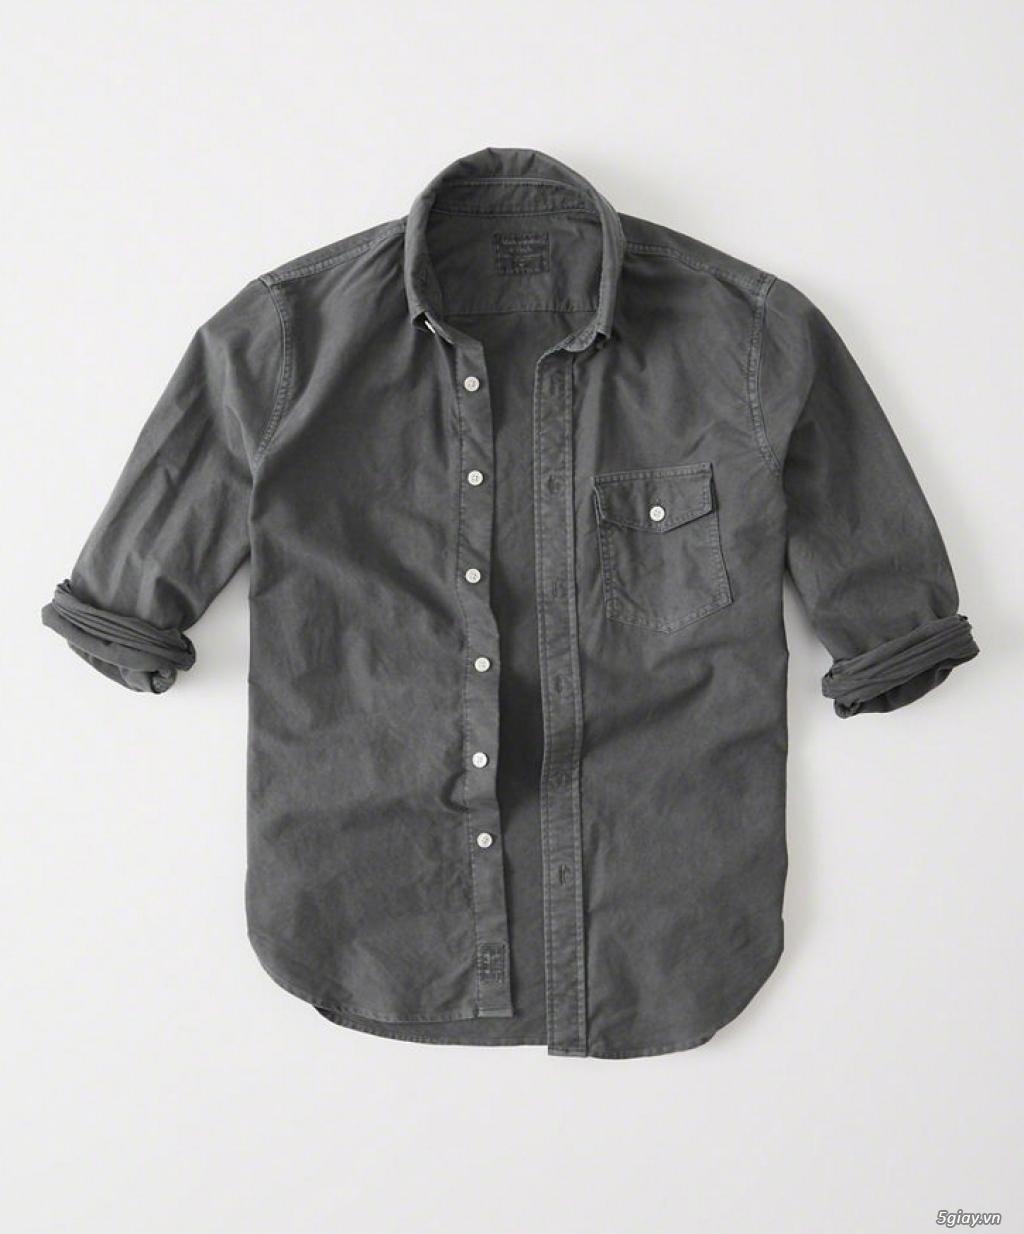 [ Lamanshop.com ]- Quần áo HOLLISTER - ABERCROMBIE & FITCH - Chính hãng USA 100% - 12